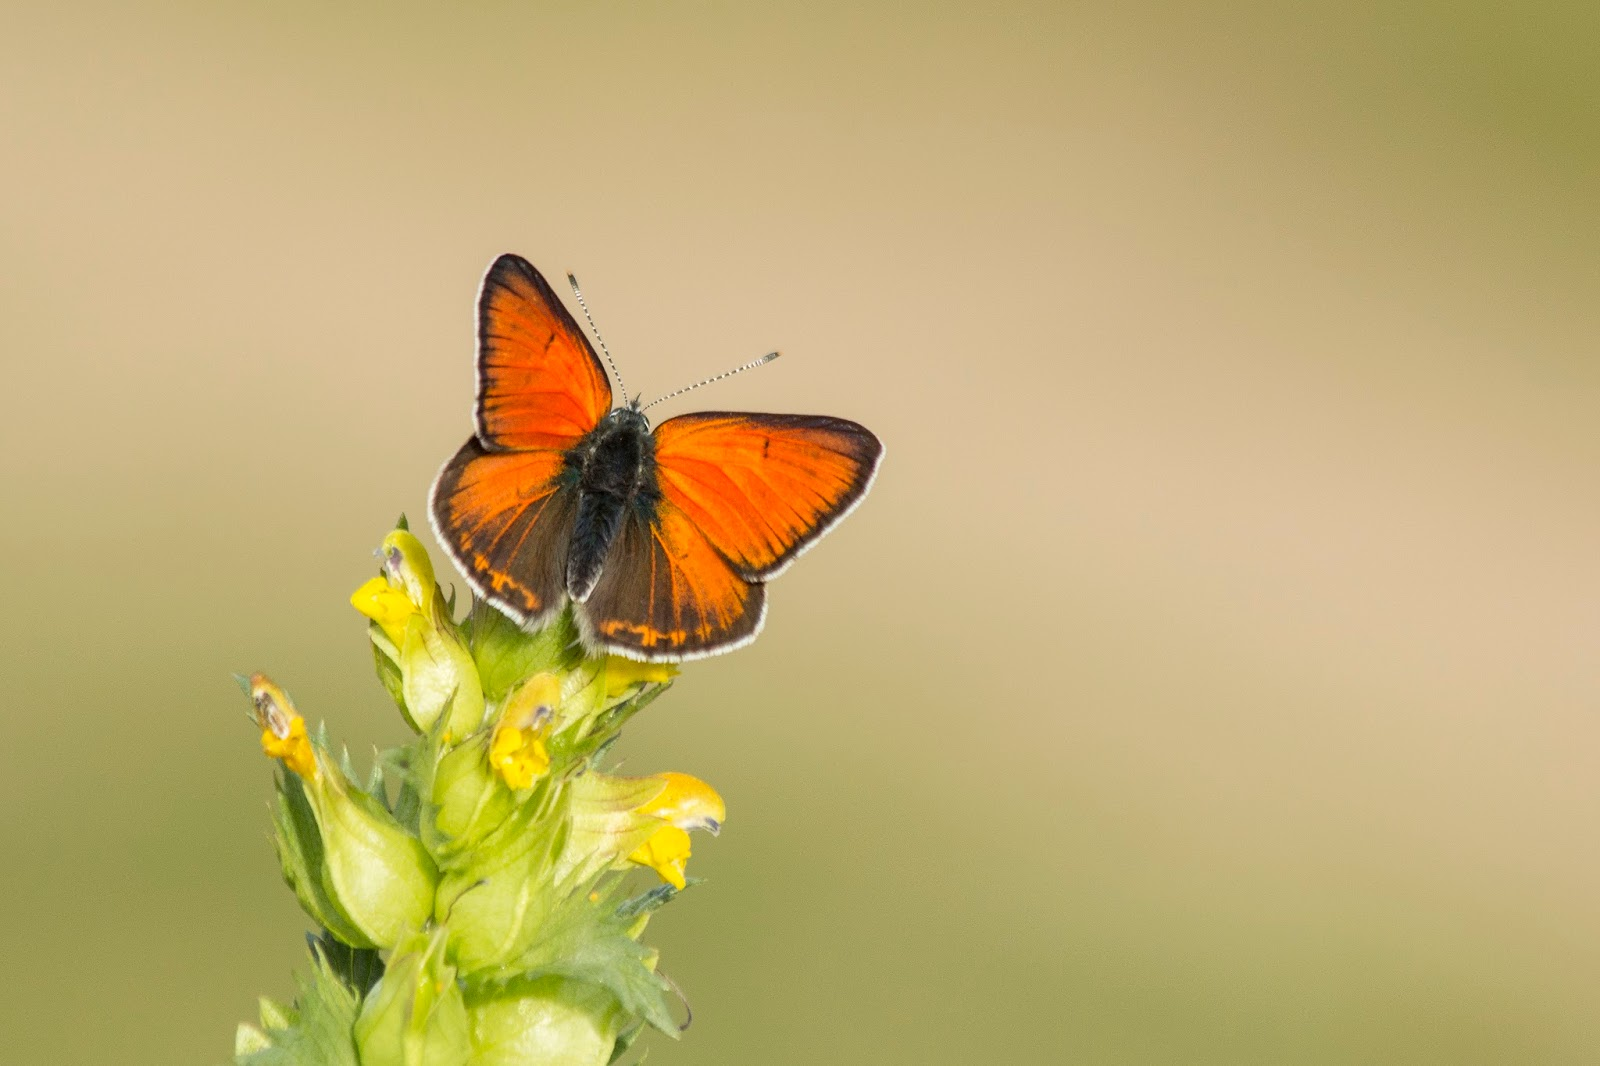 Rode vuurvlinder, galerij vlinders